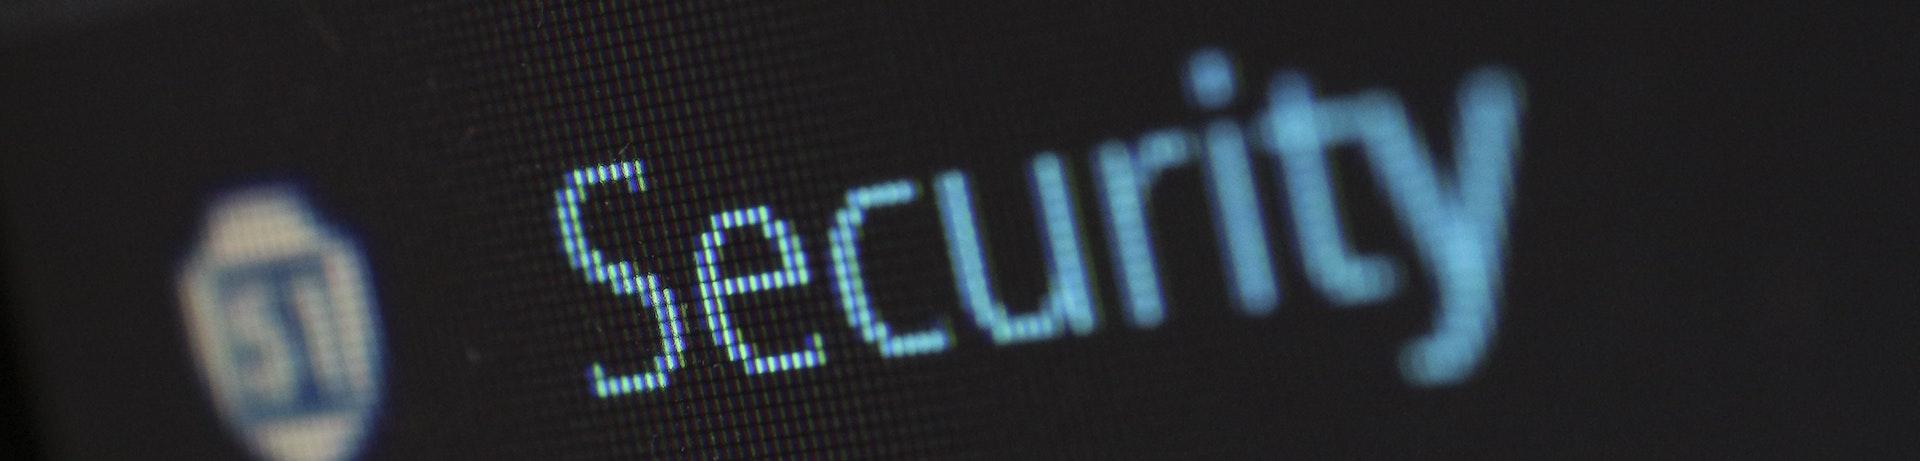 CAP5 website security